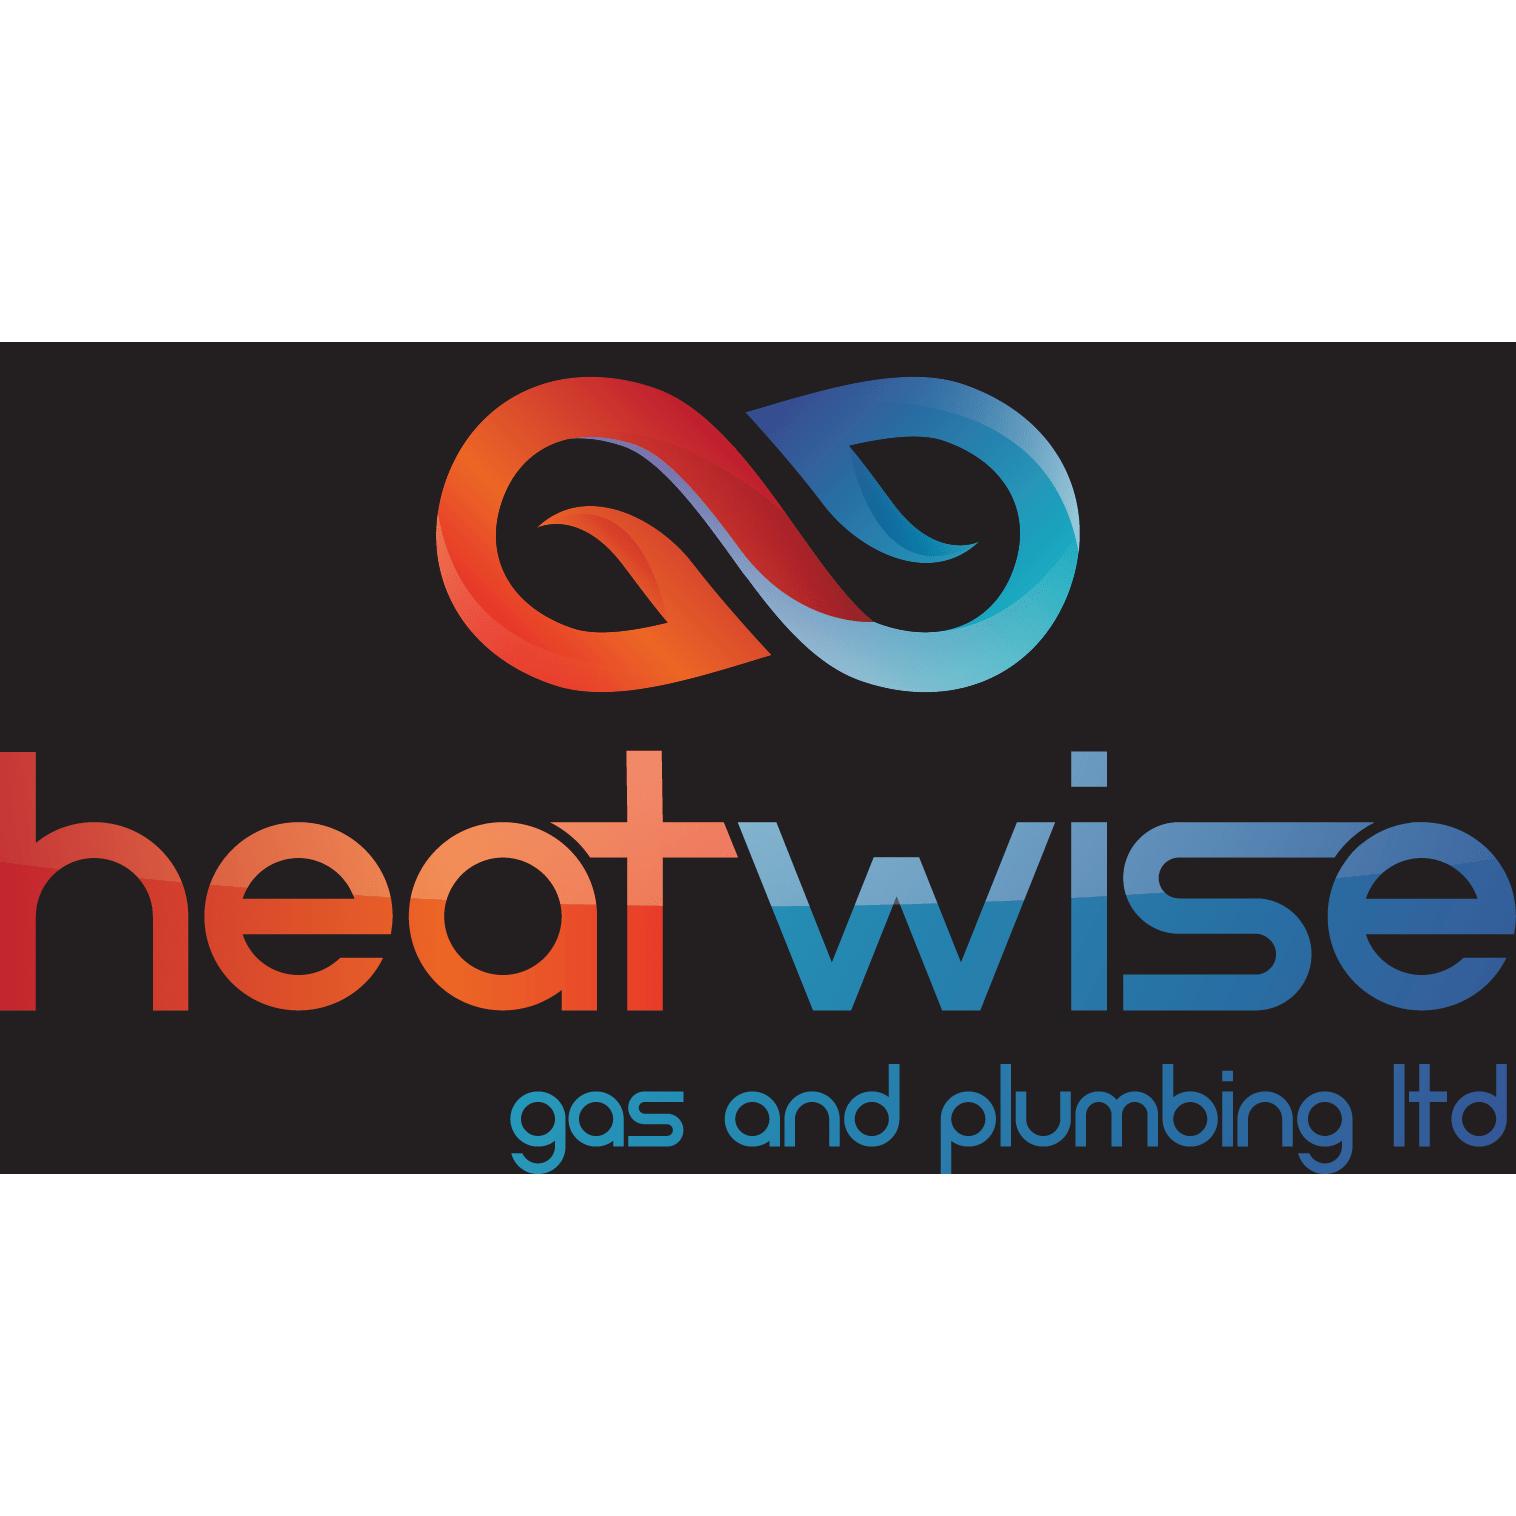 Heatwise Gas & Plumbing Ltd